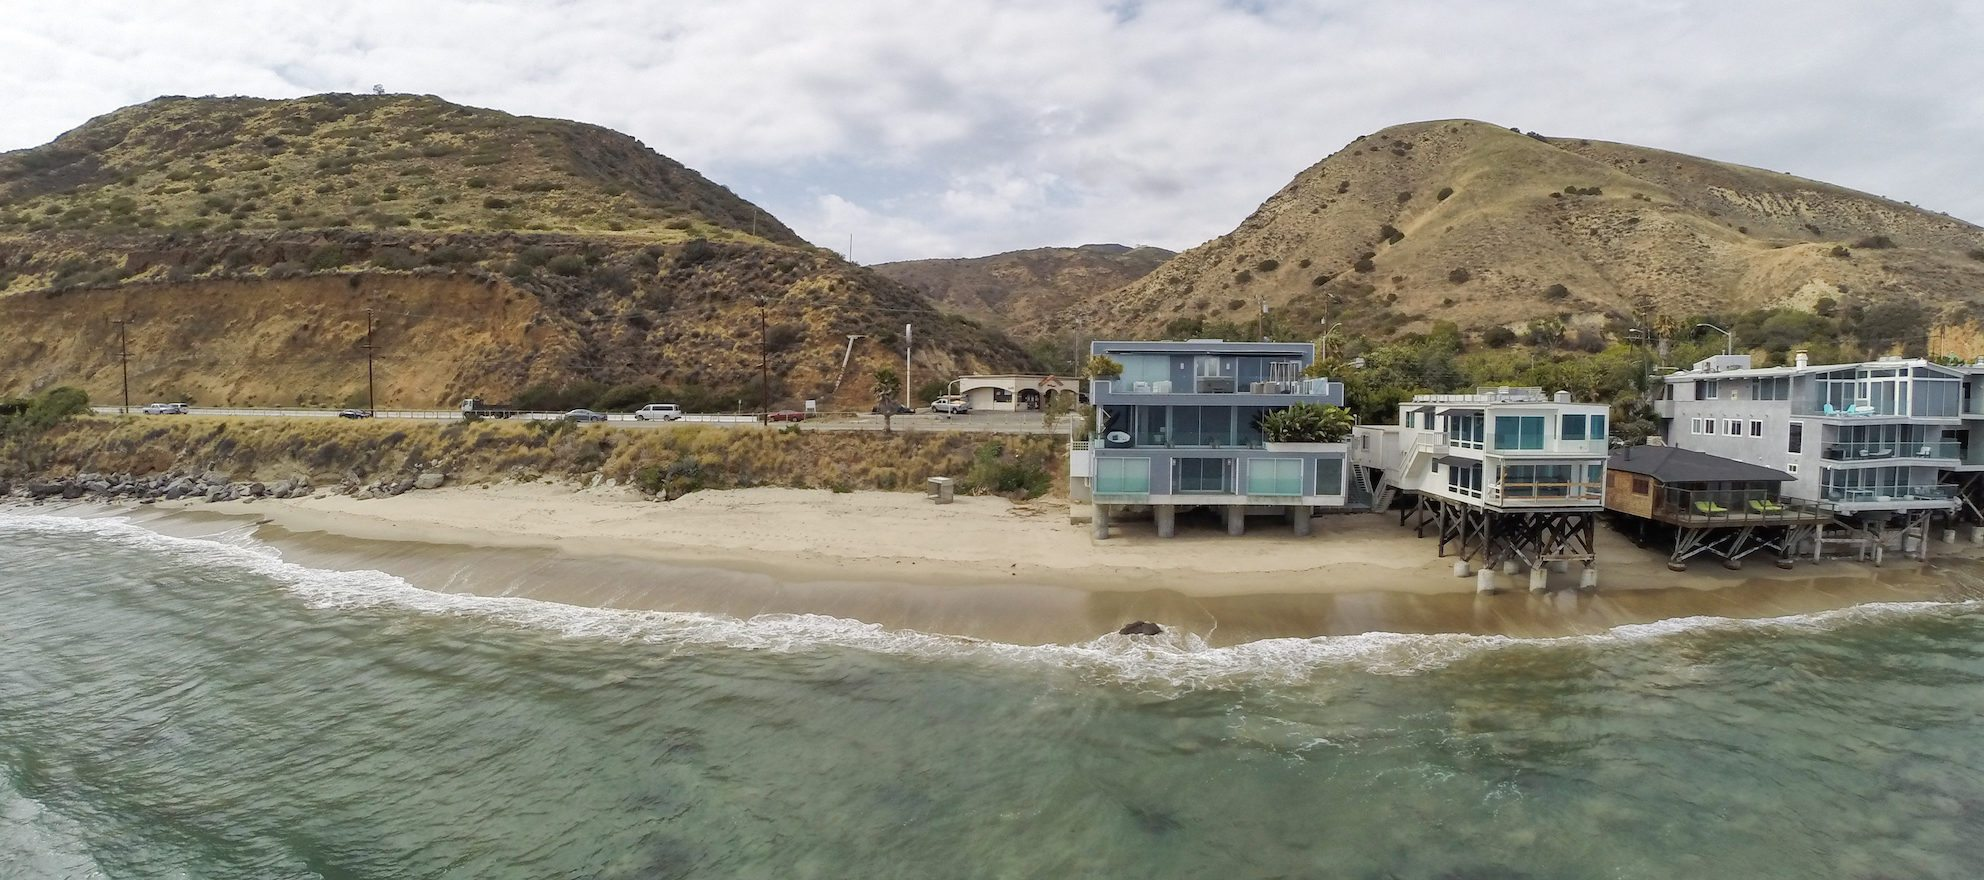 Luxury listing of the day: Sleek, modern abode on the Malibu, Calif., shoreline